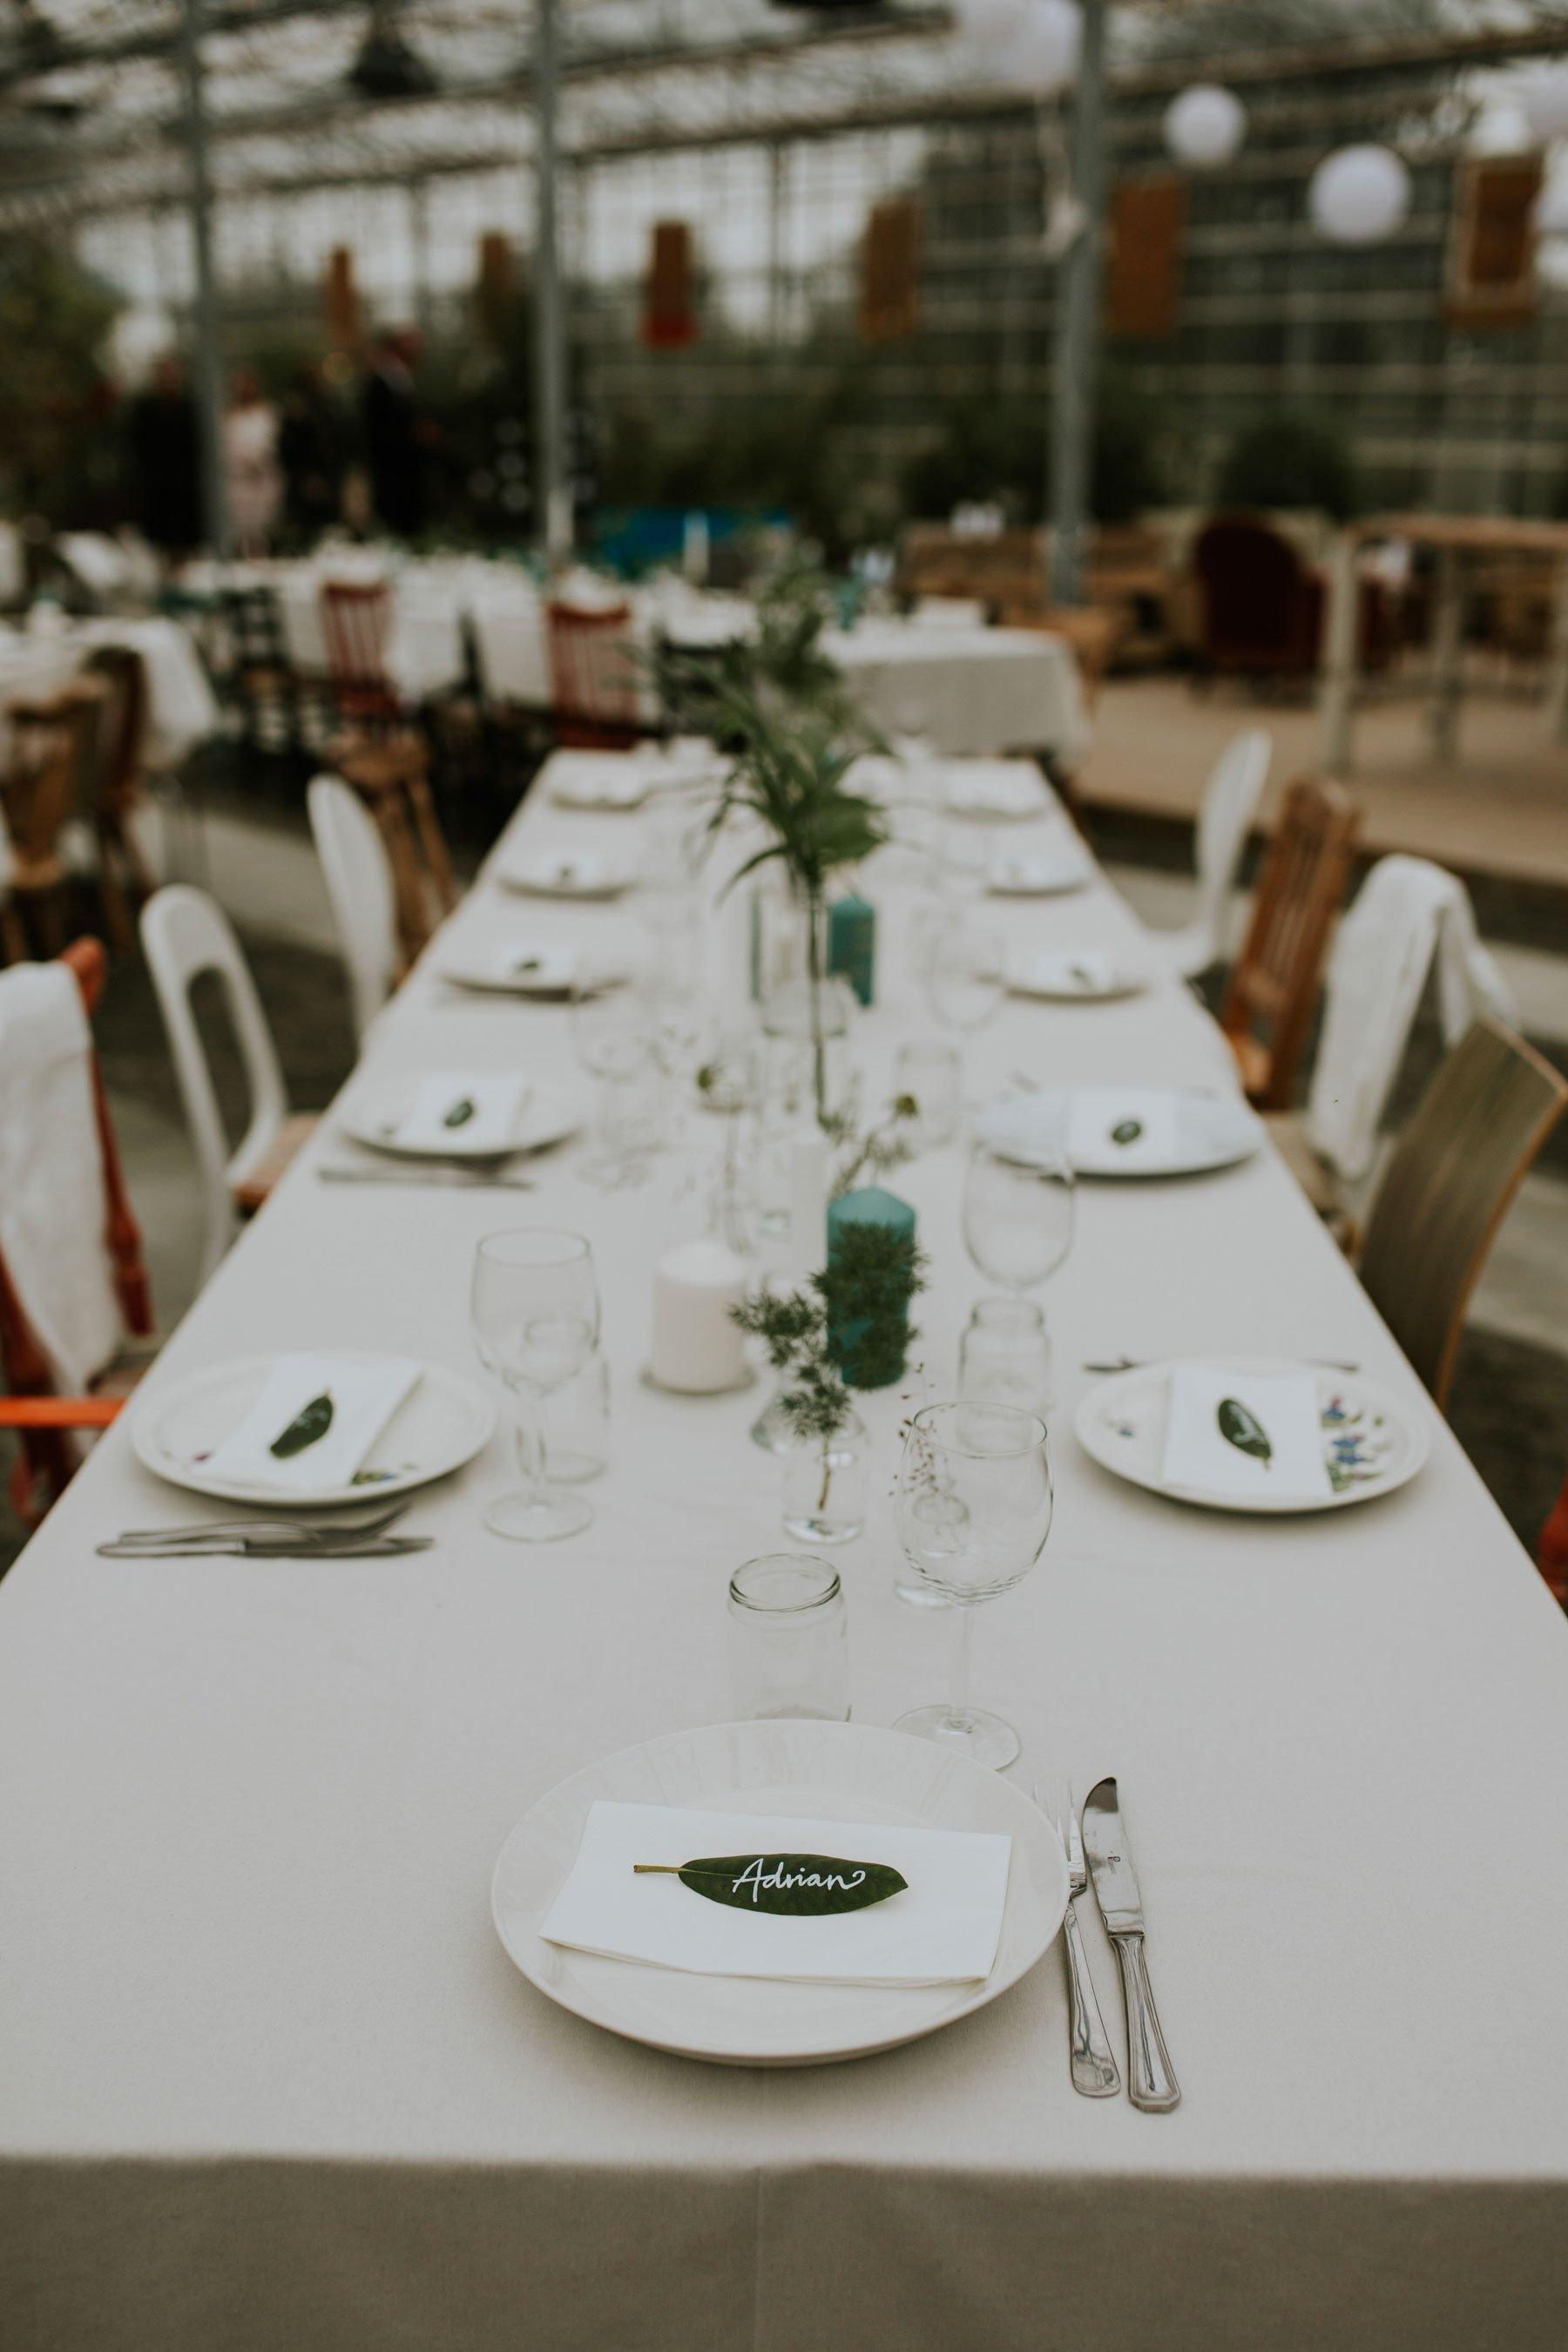 table norwegian wedding lineowrenfotografi tuvamats